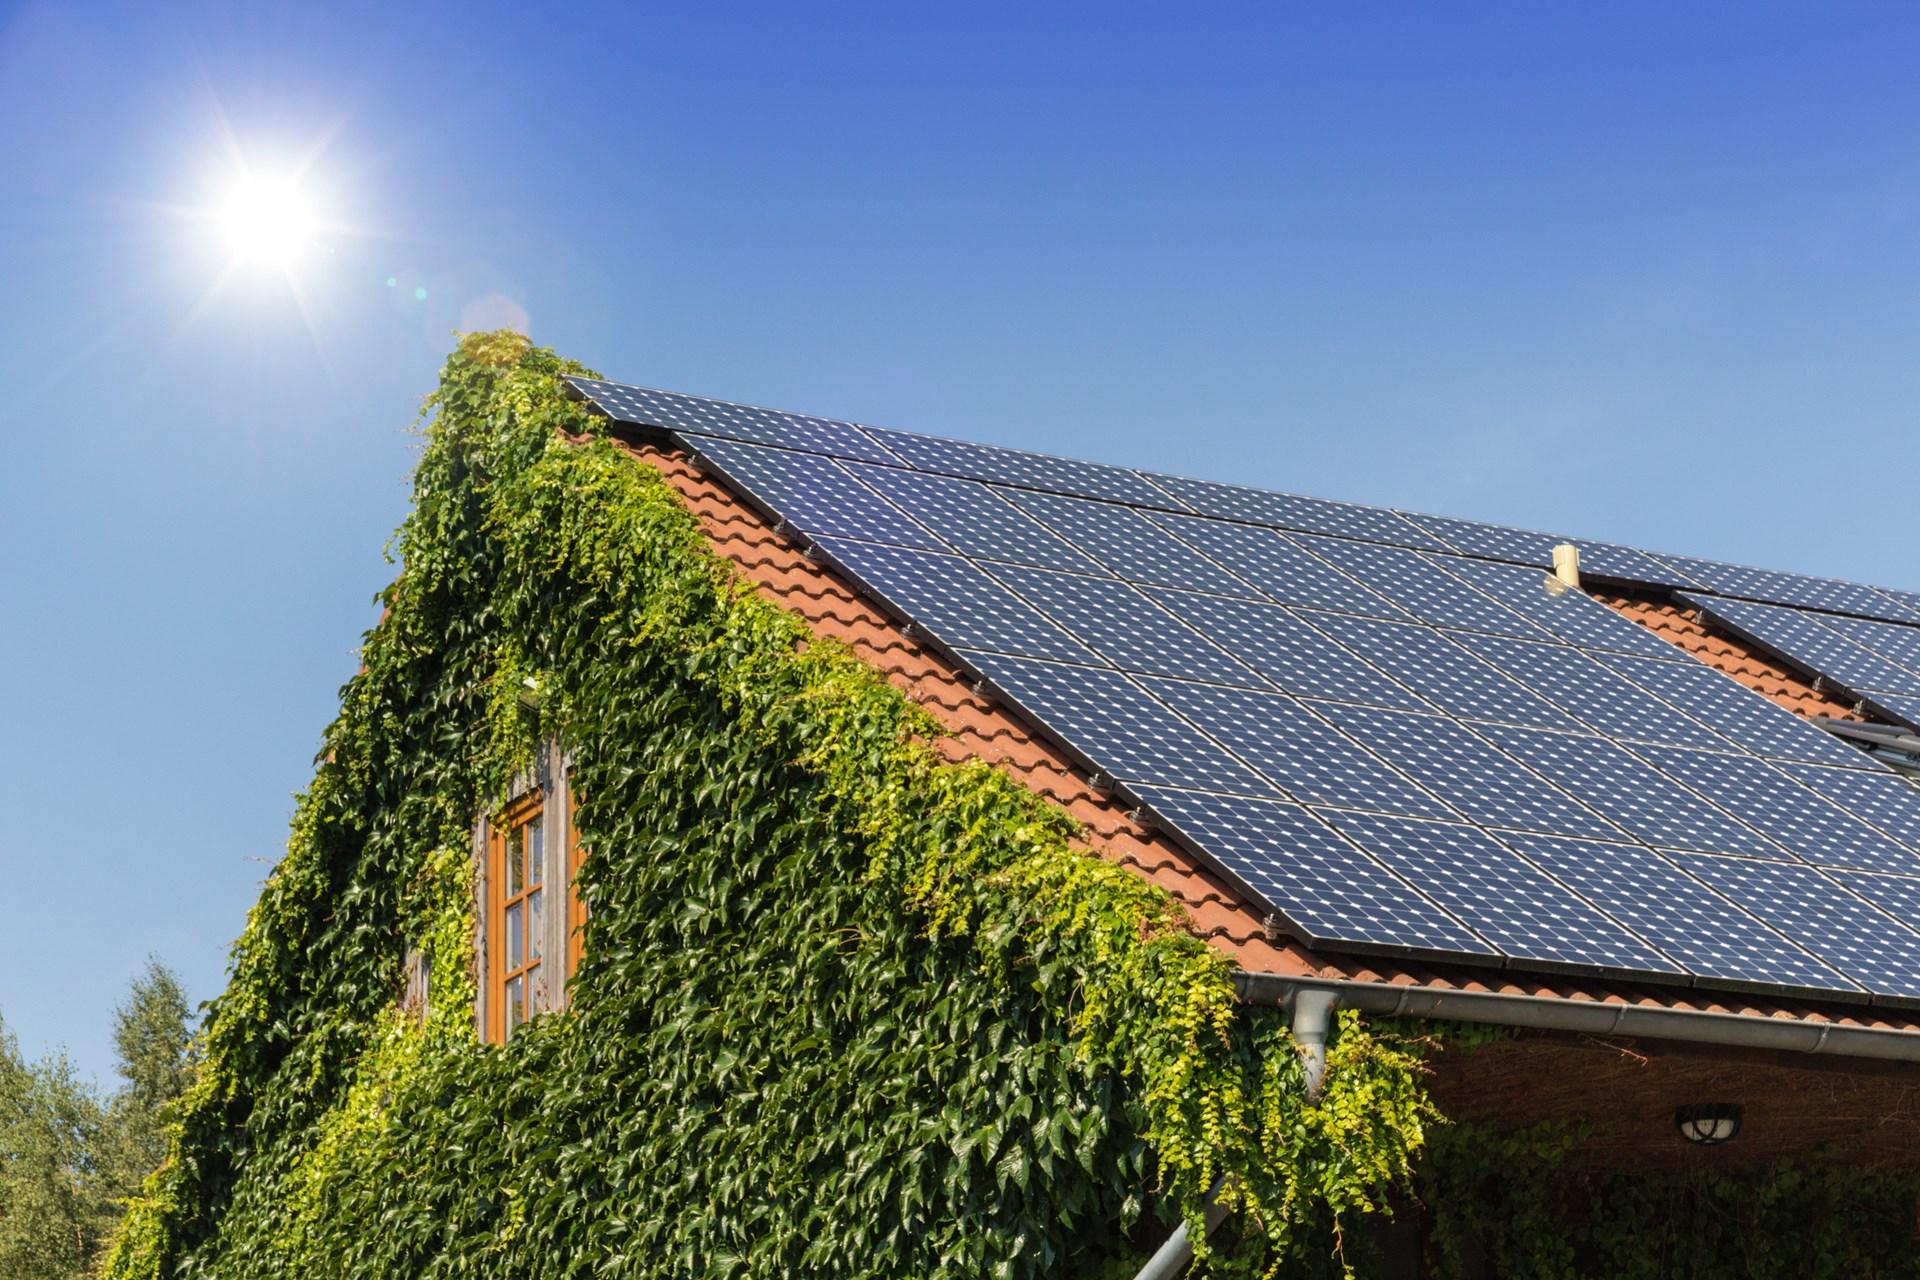 Tariffs Make Solar Panels Excessively Expensive